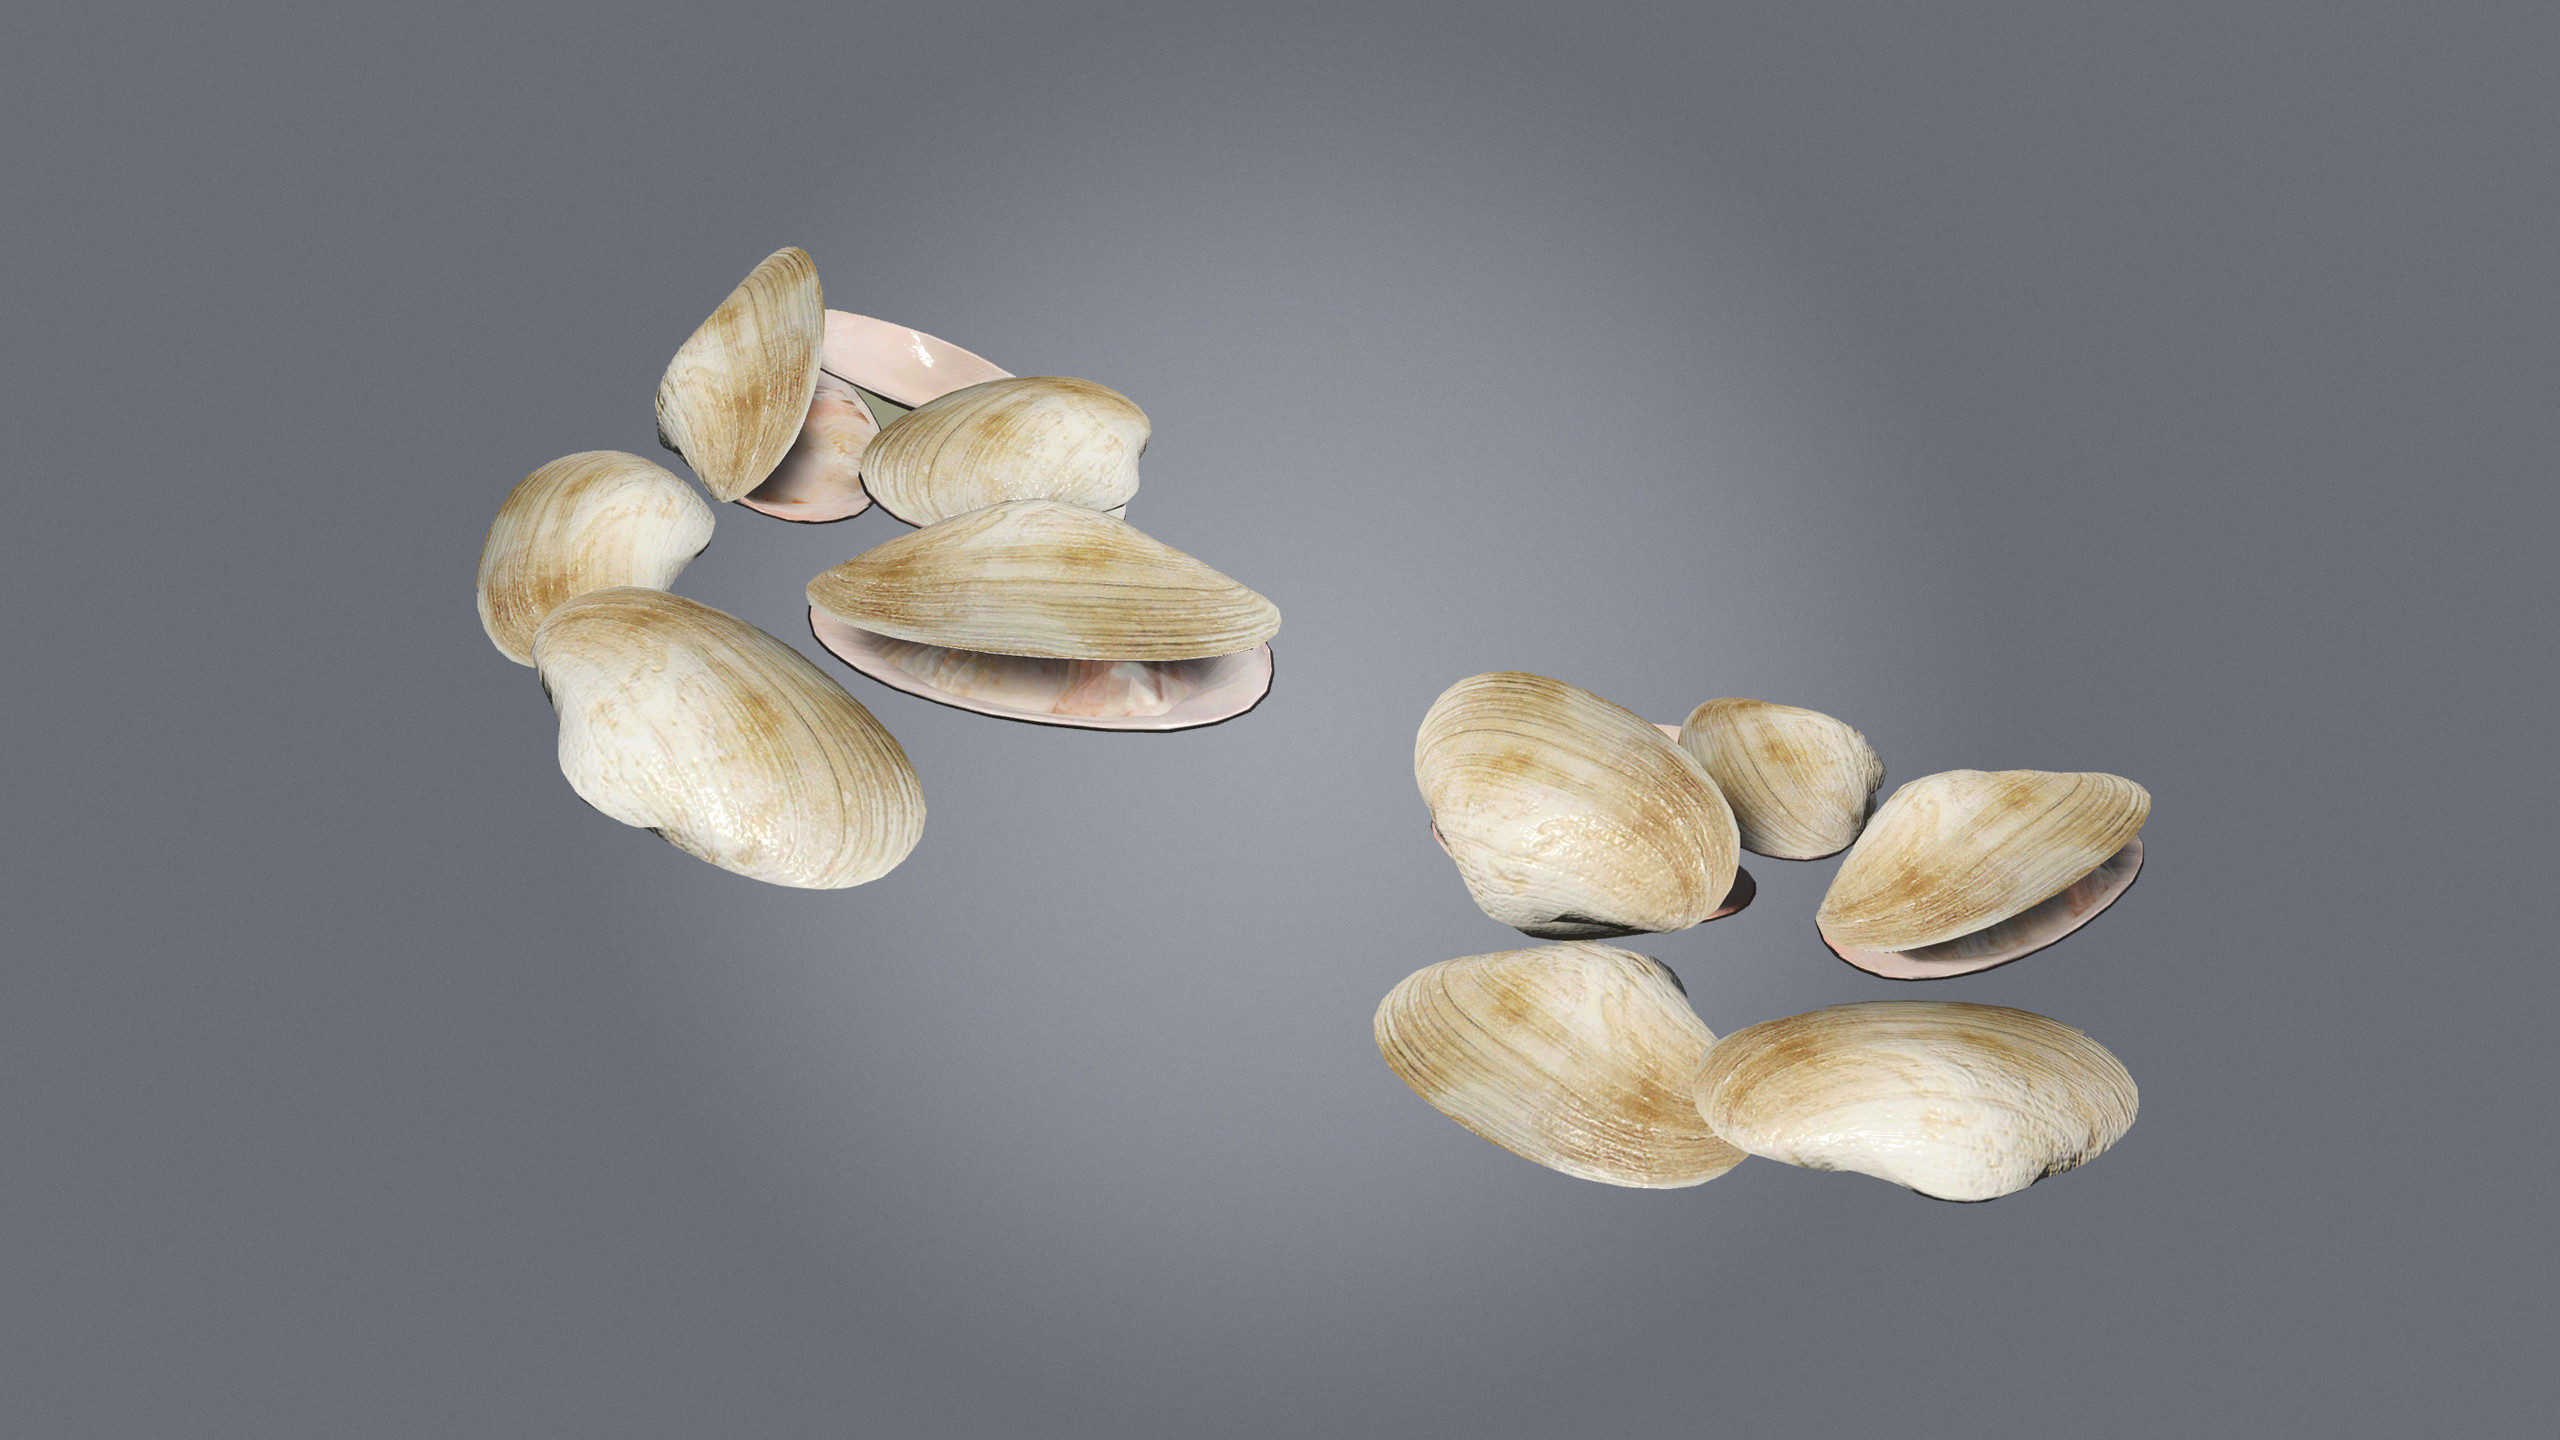 Clams, found on beaches